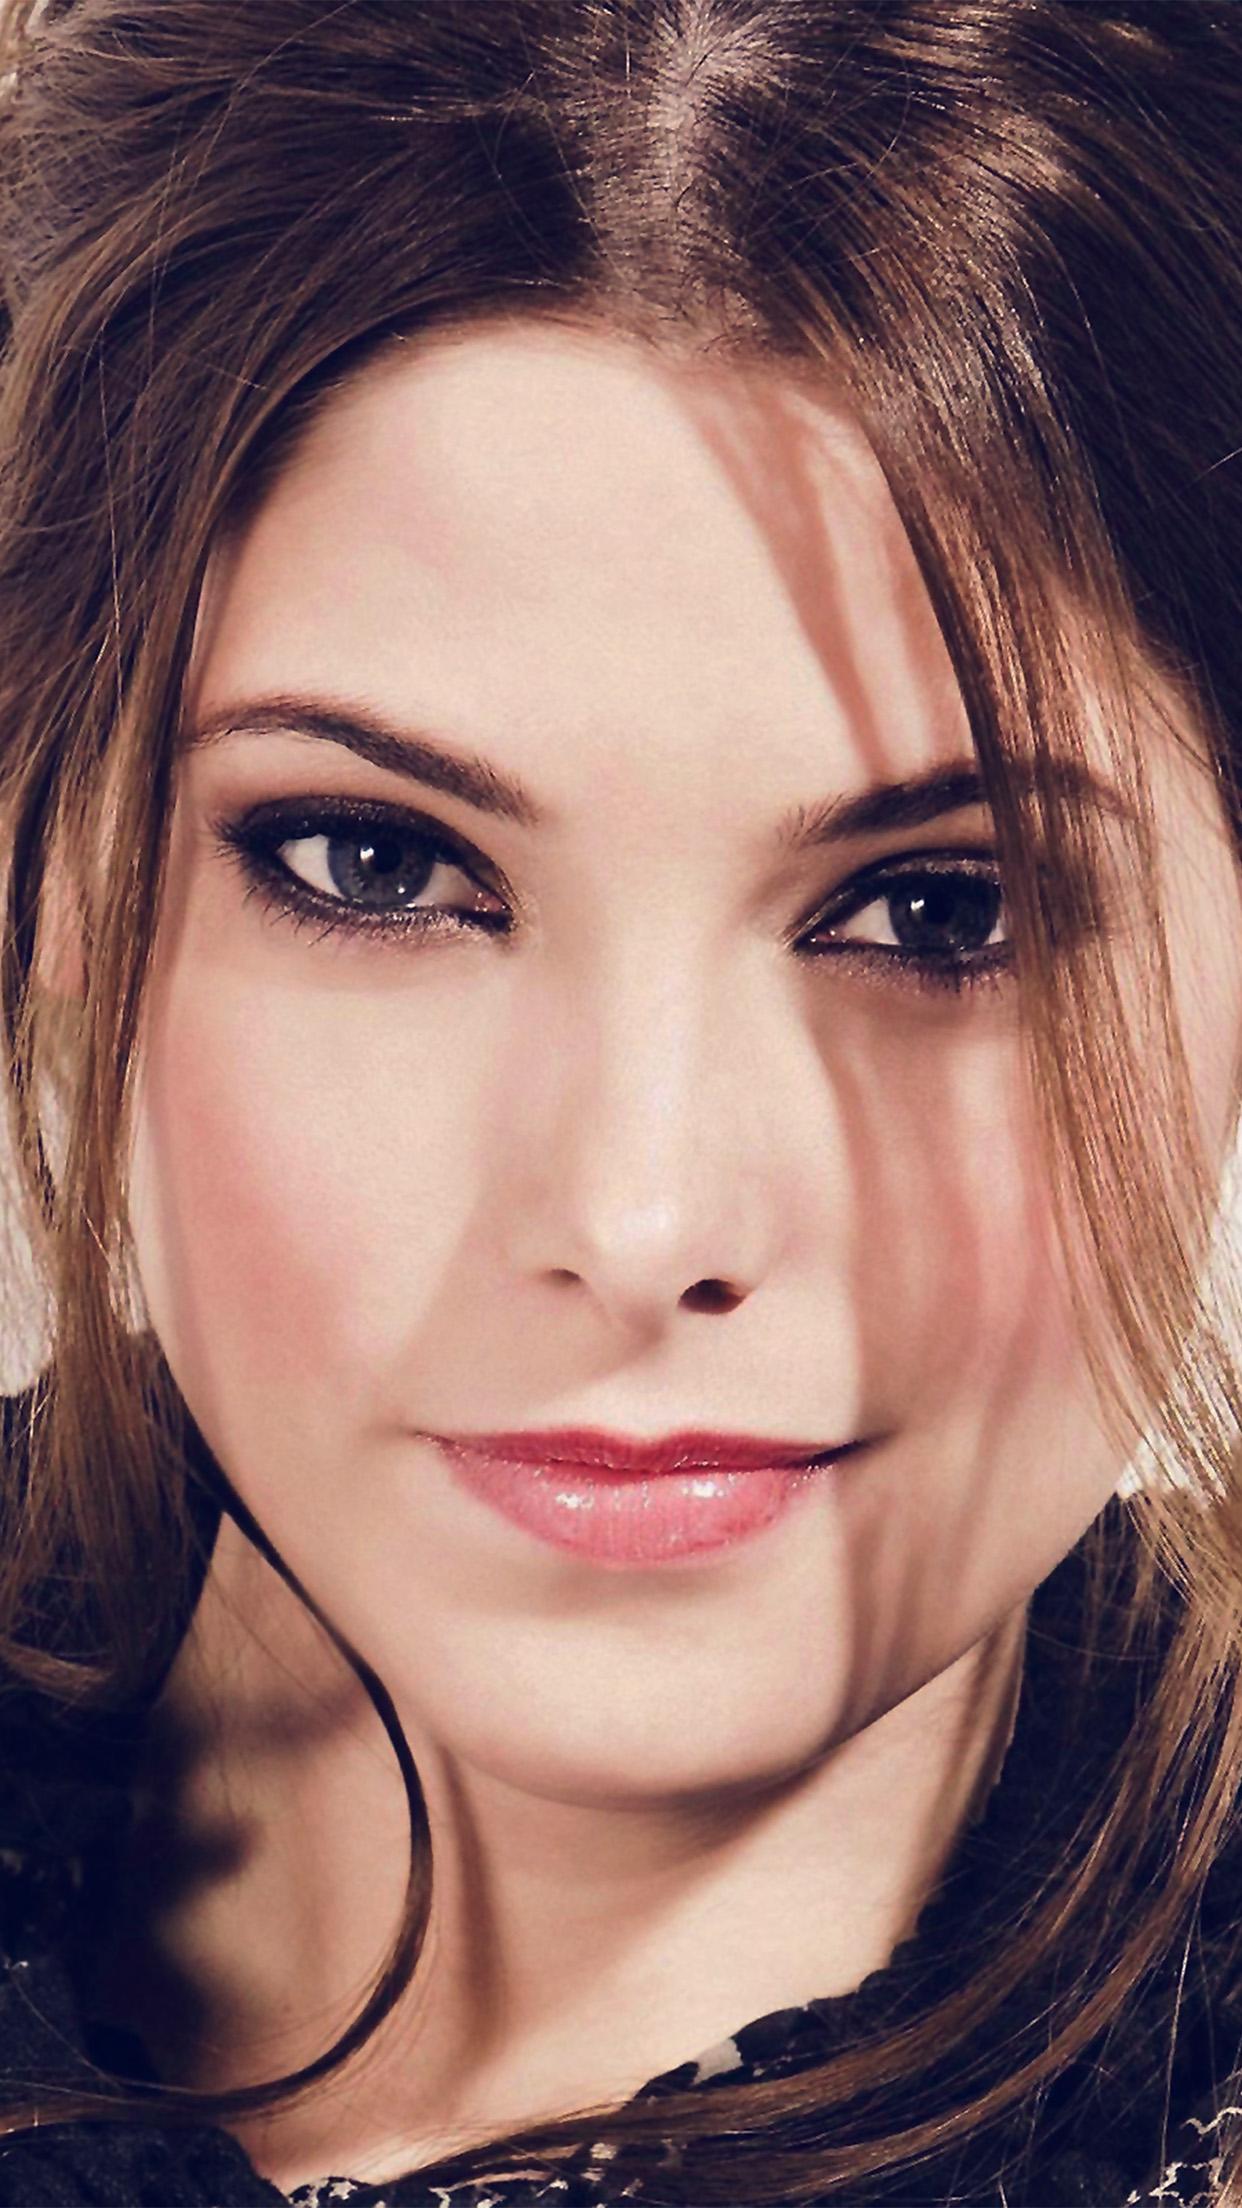 Hh72-ashley-greene-actress-film-wallpaper